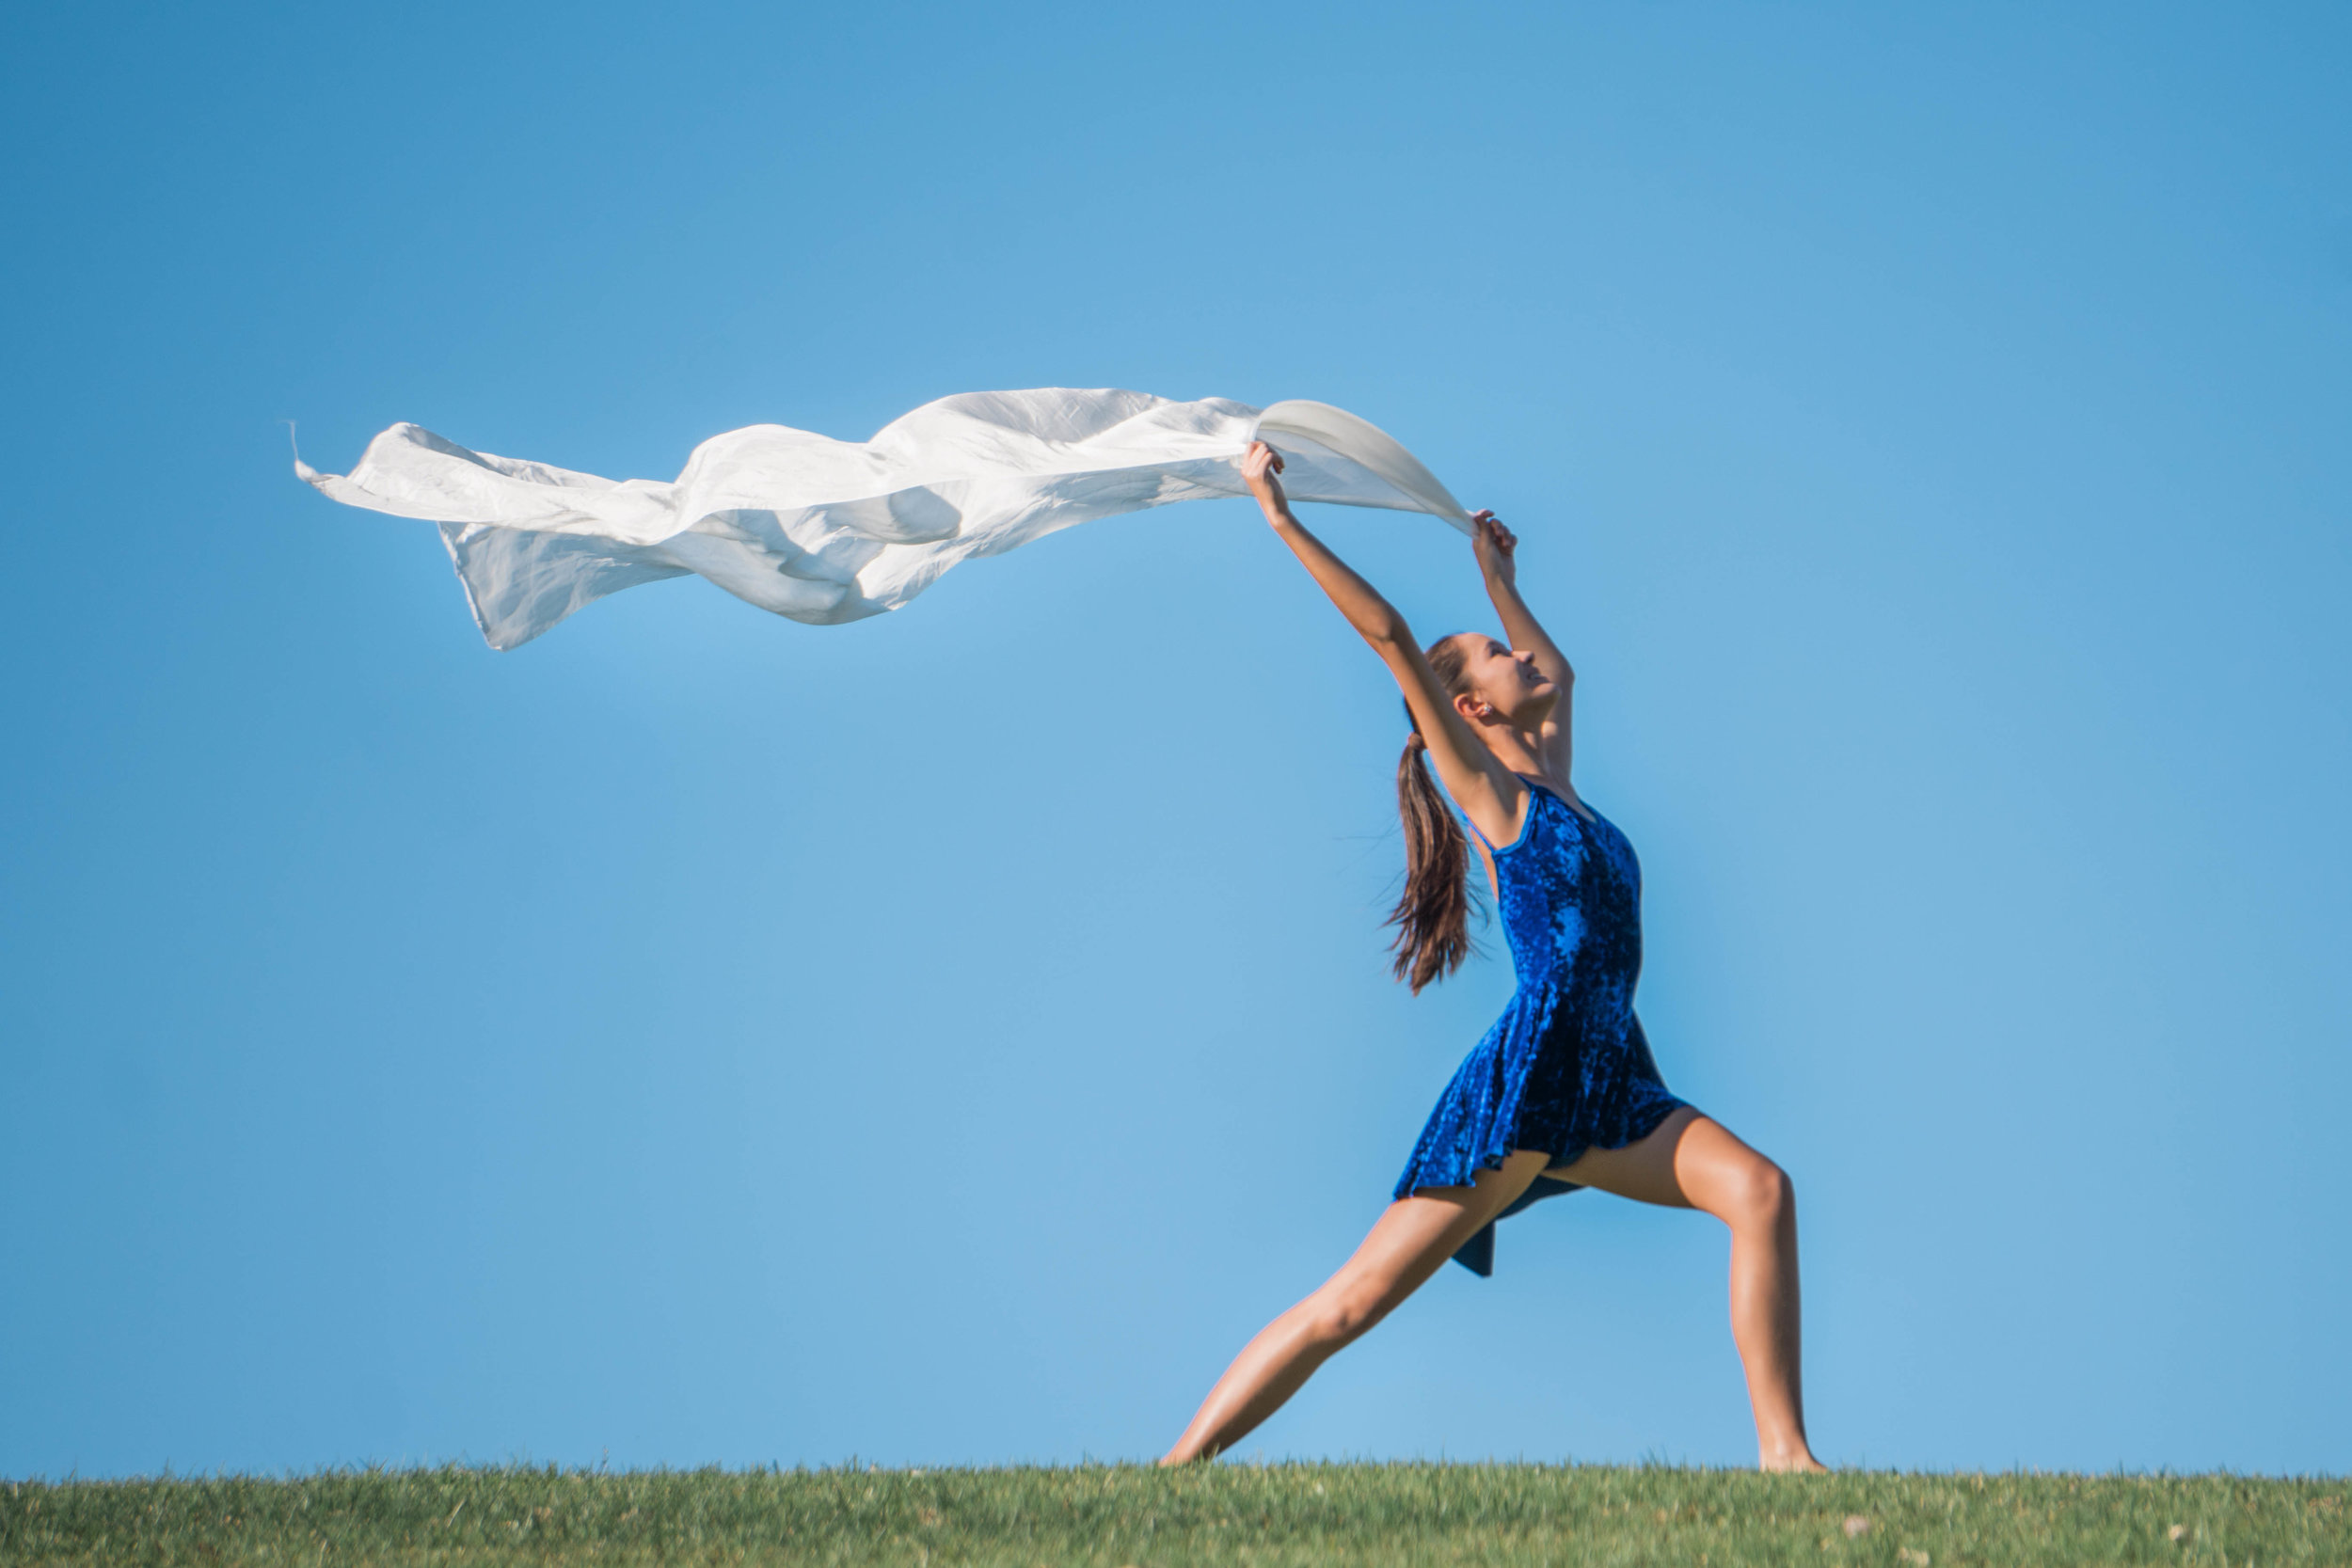 Hinterland-Dance-20.08.17-26.jpg